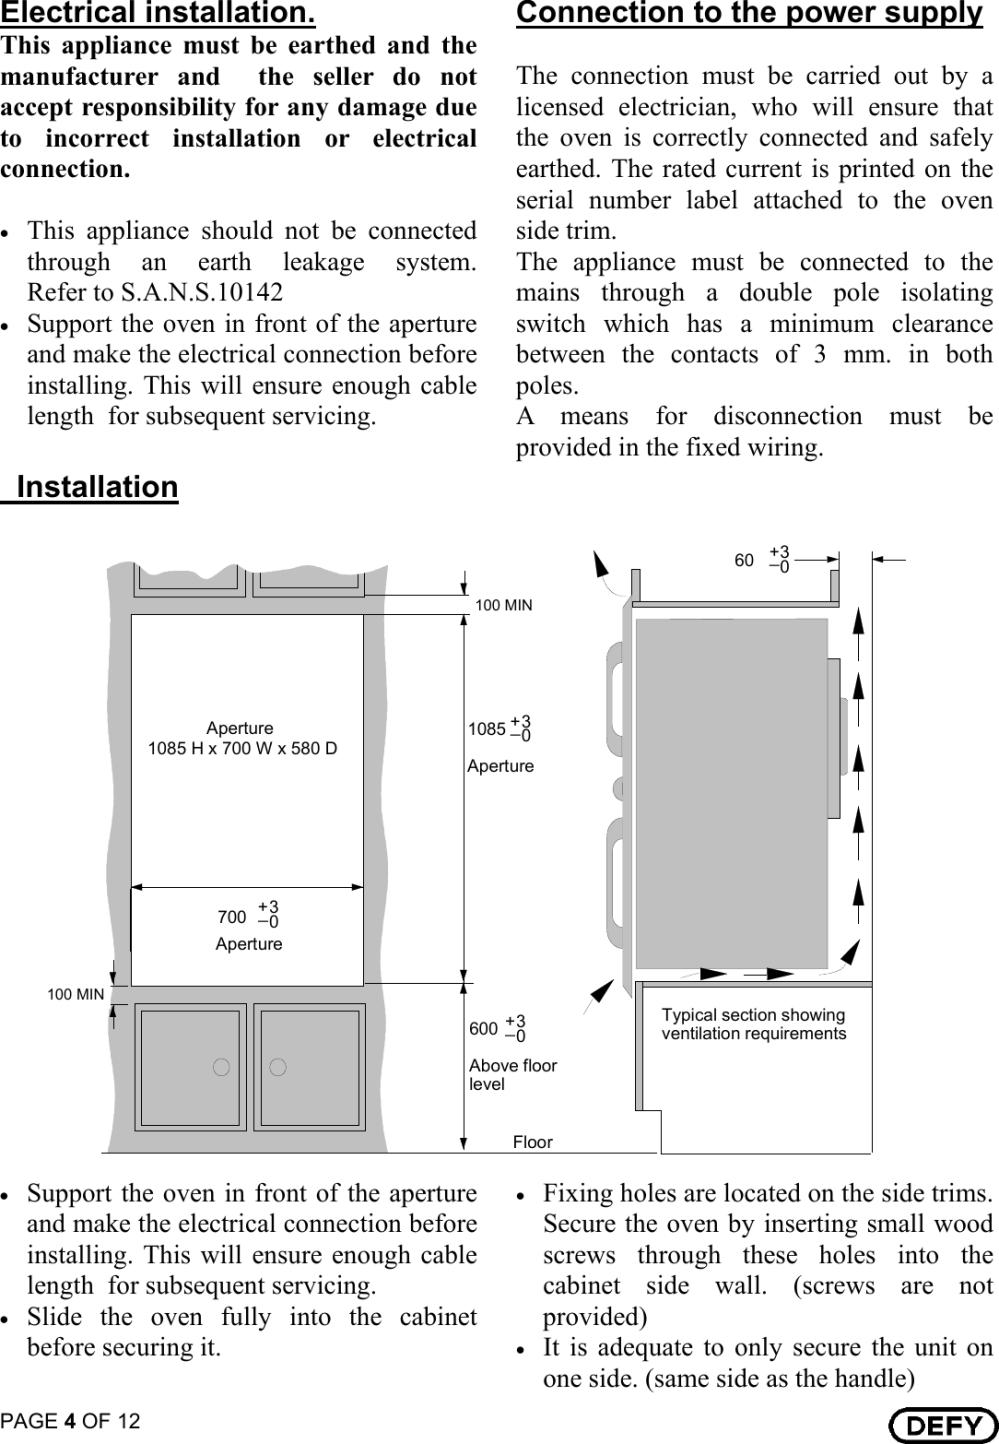 medium resolution of defy gemini gourmet double oven wiring diagram solutions